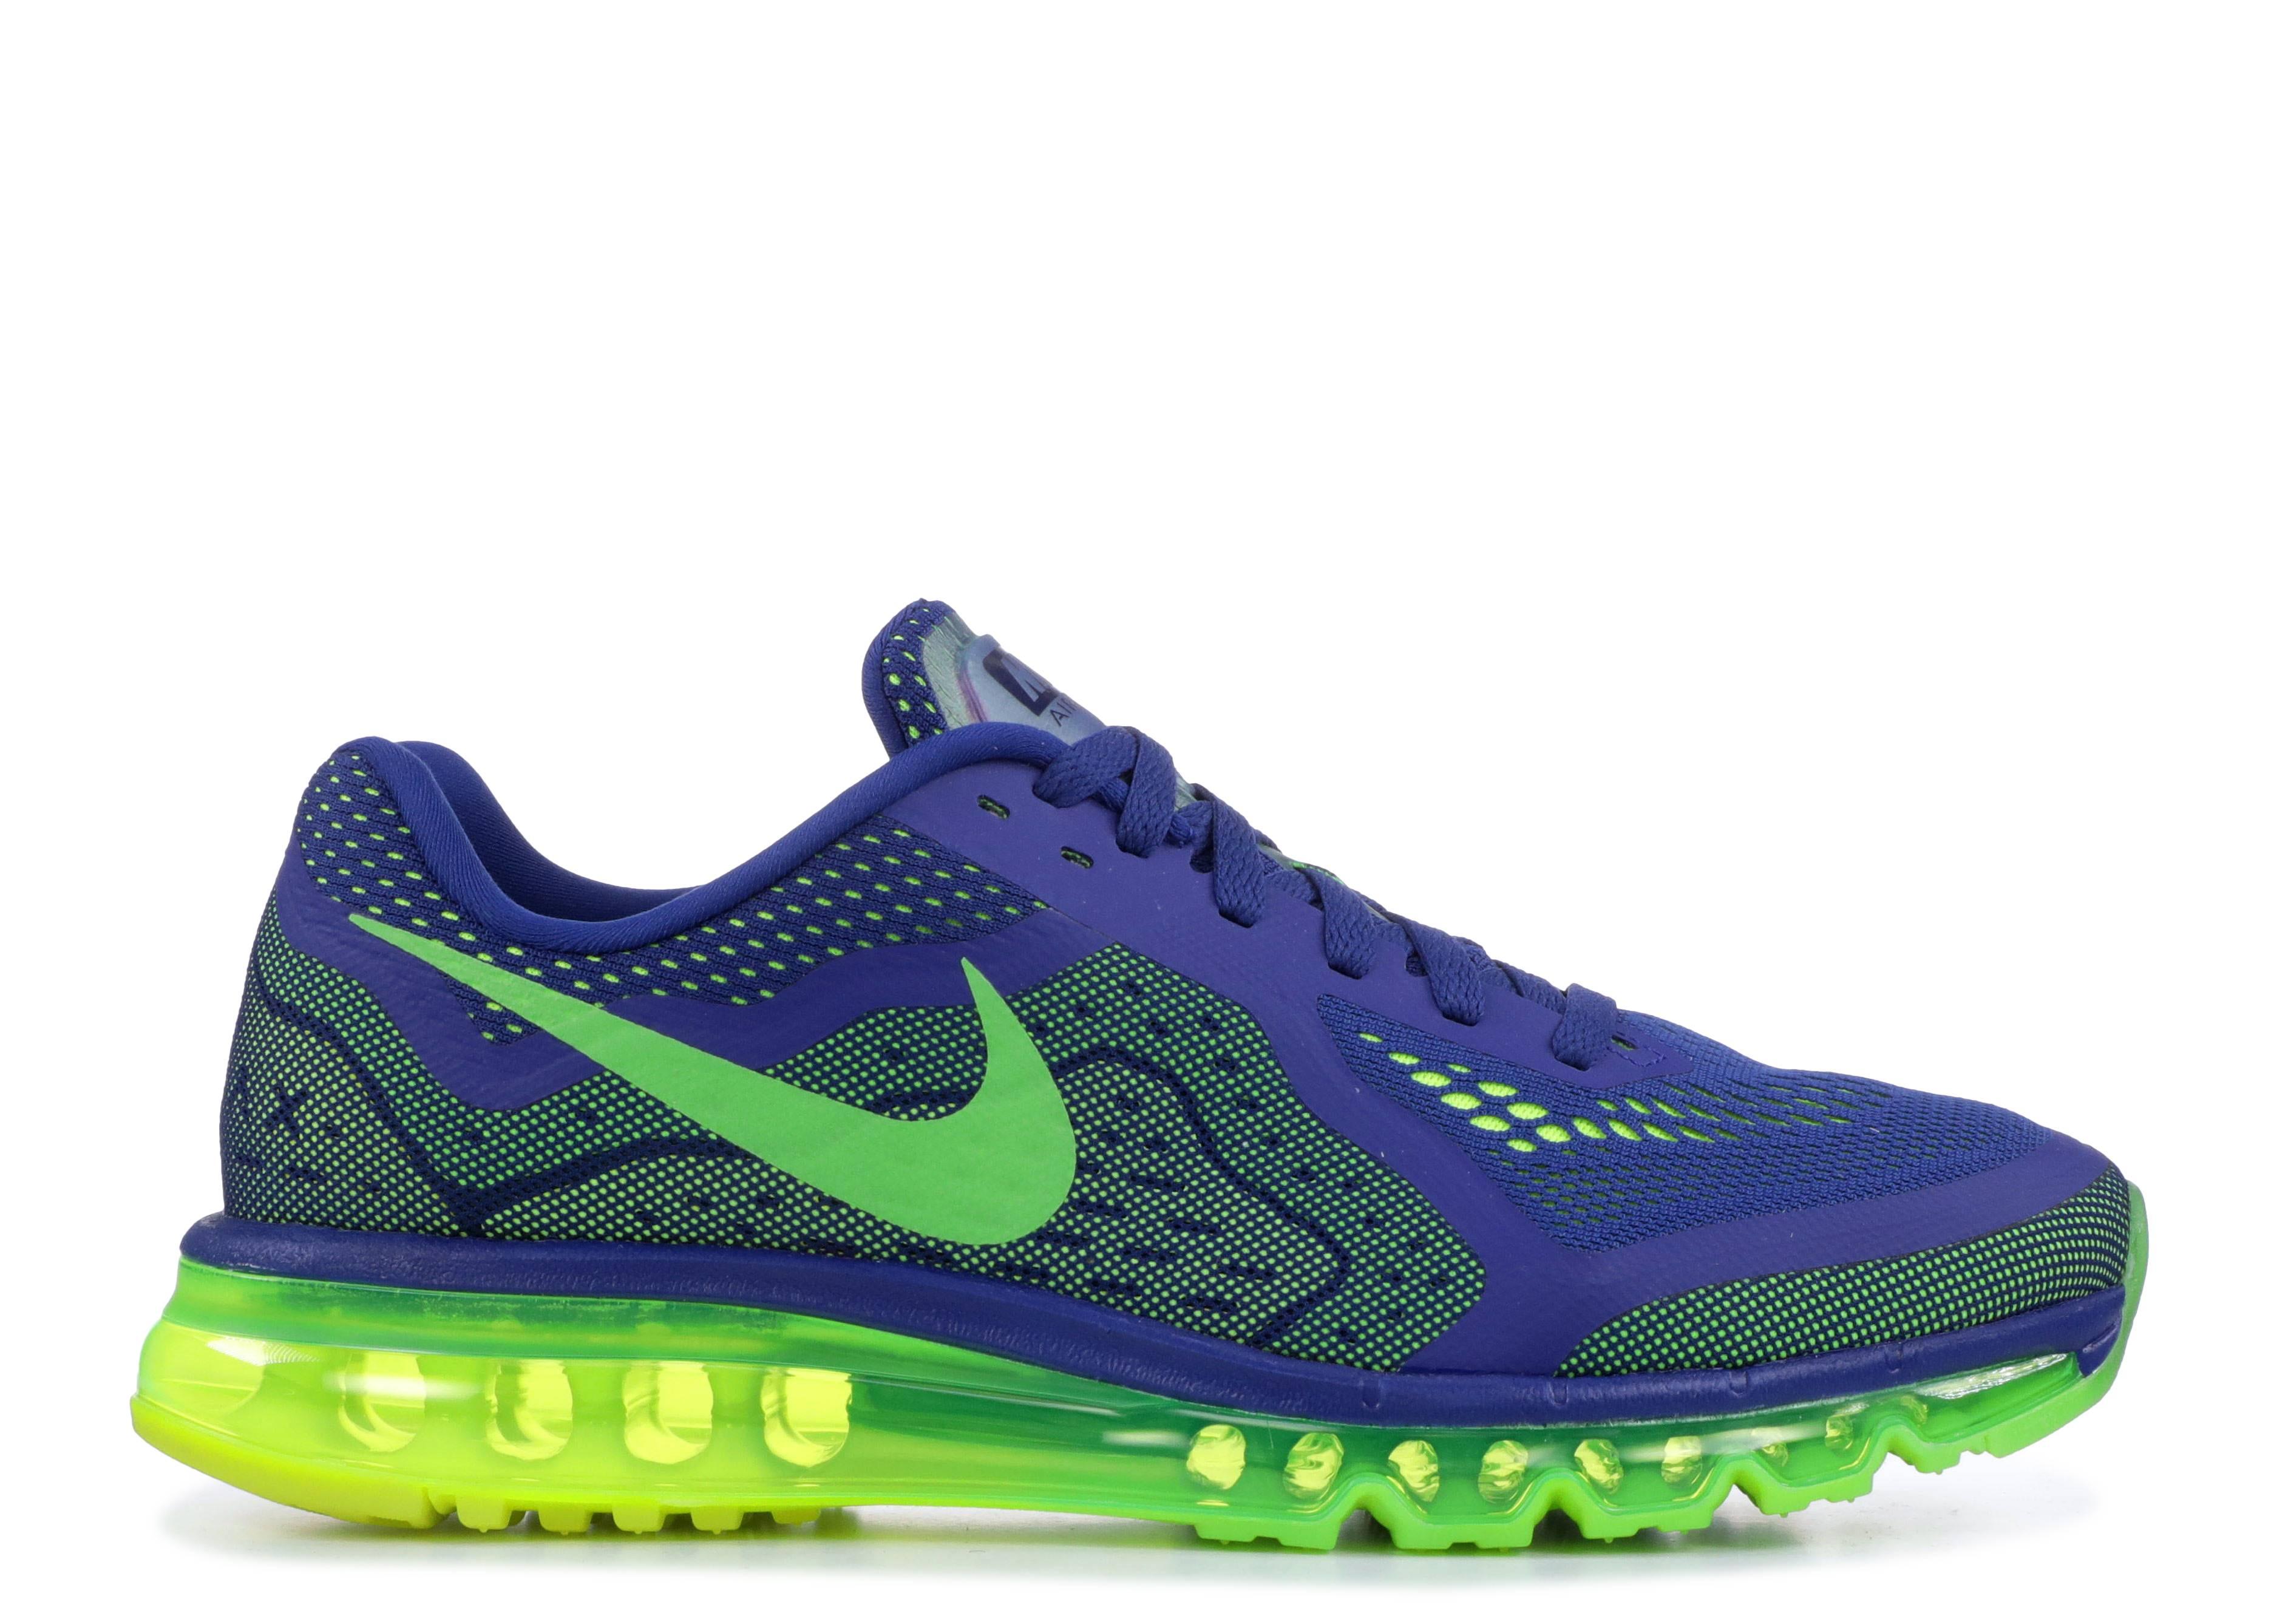 separation shoes 81362 a0457 nike. Air max 2014